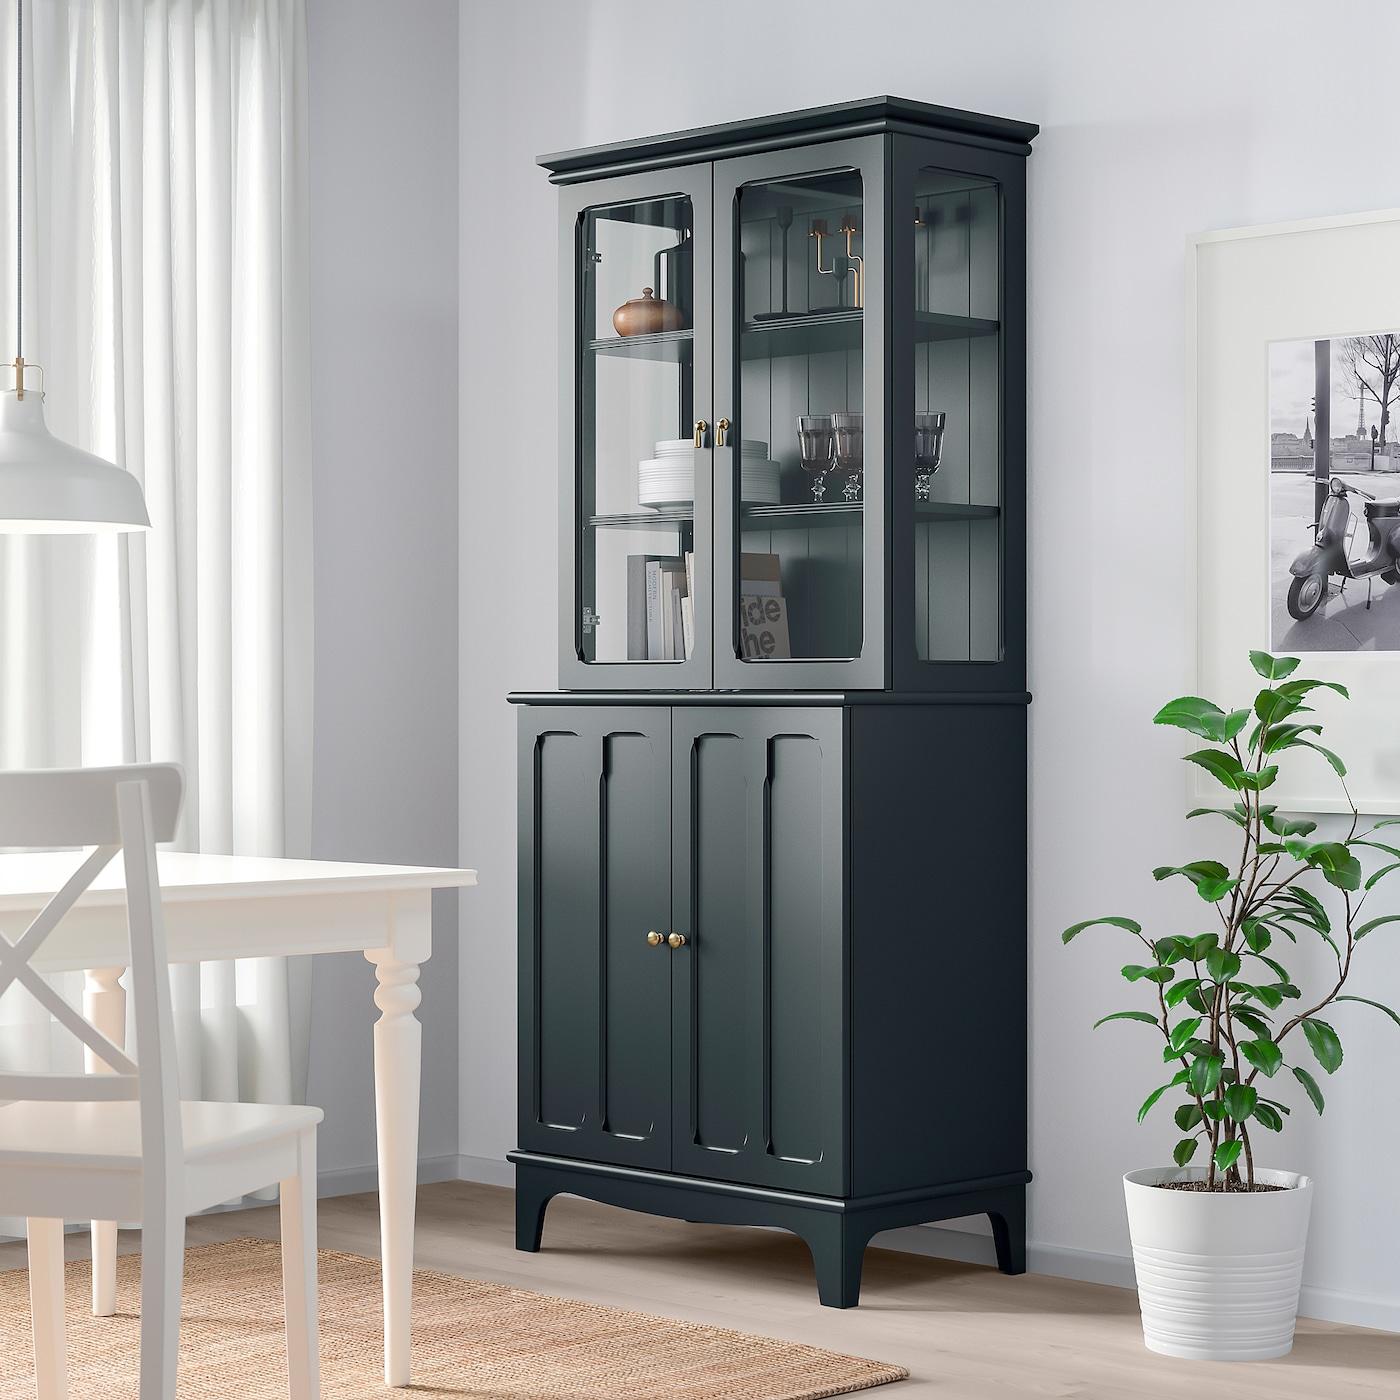 LOMMARP dark blue green, Cabinet with glass doors, 20x20 cm   IKEA